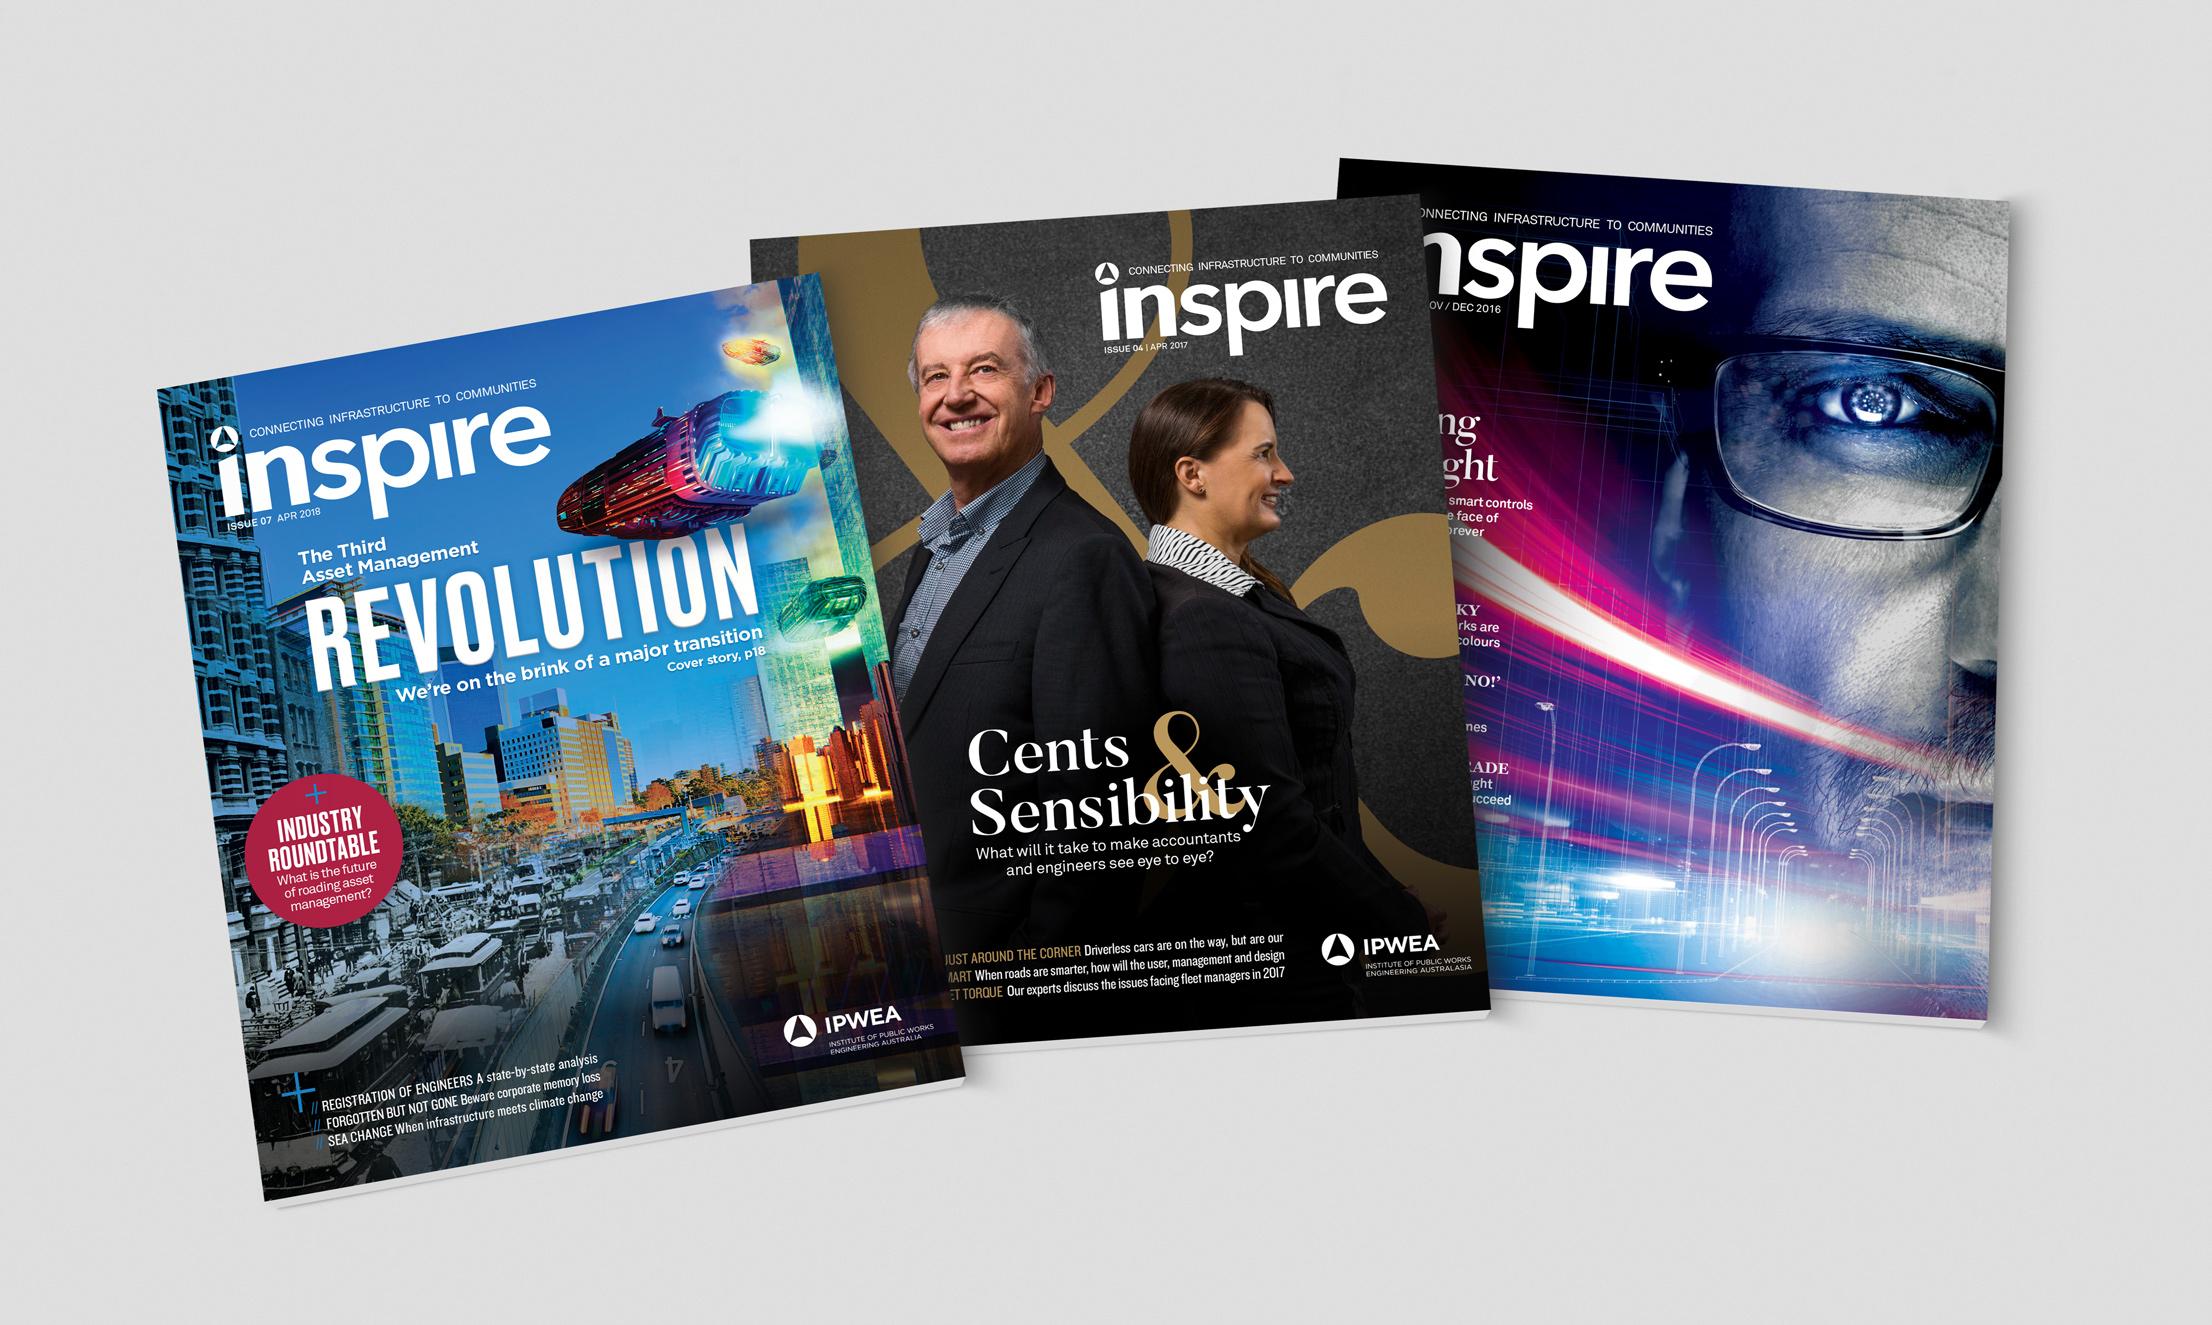 Inspire-Magazine-IPWEA-Handle-Sydney-Branding_Agency_02.jpg